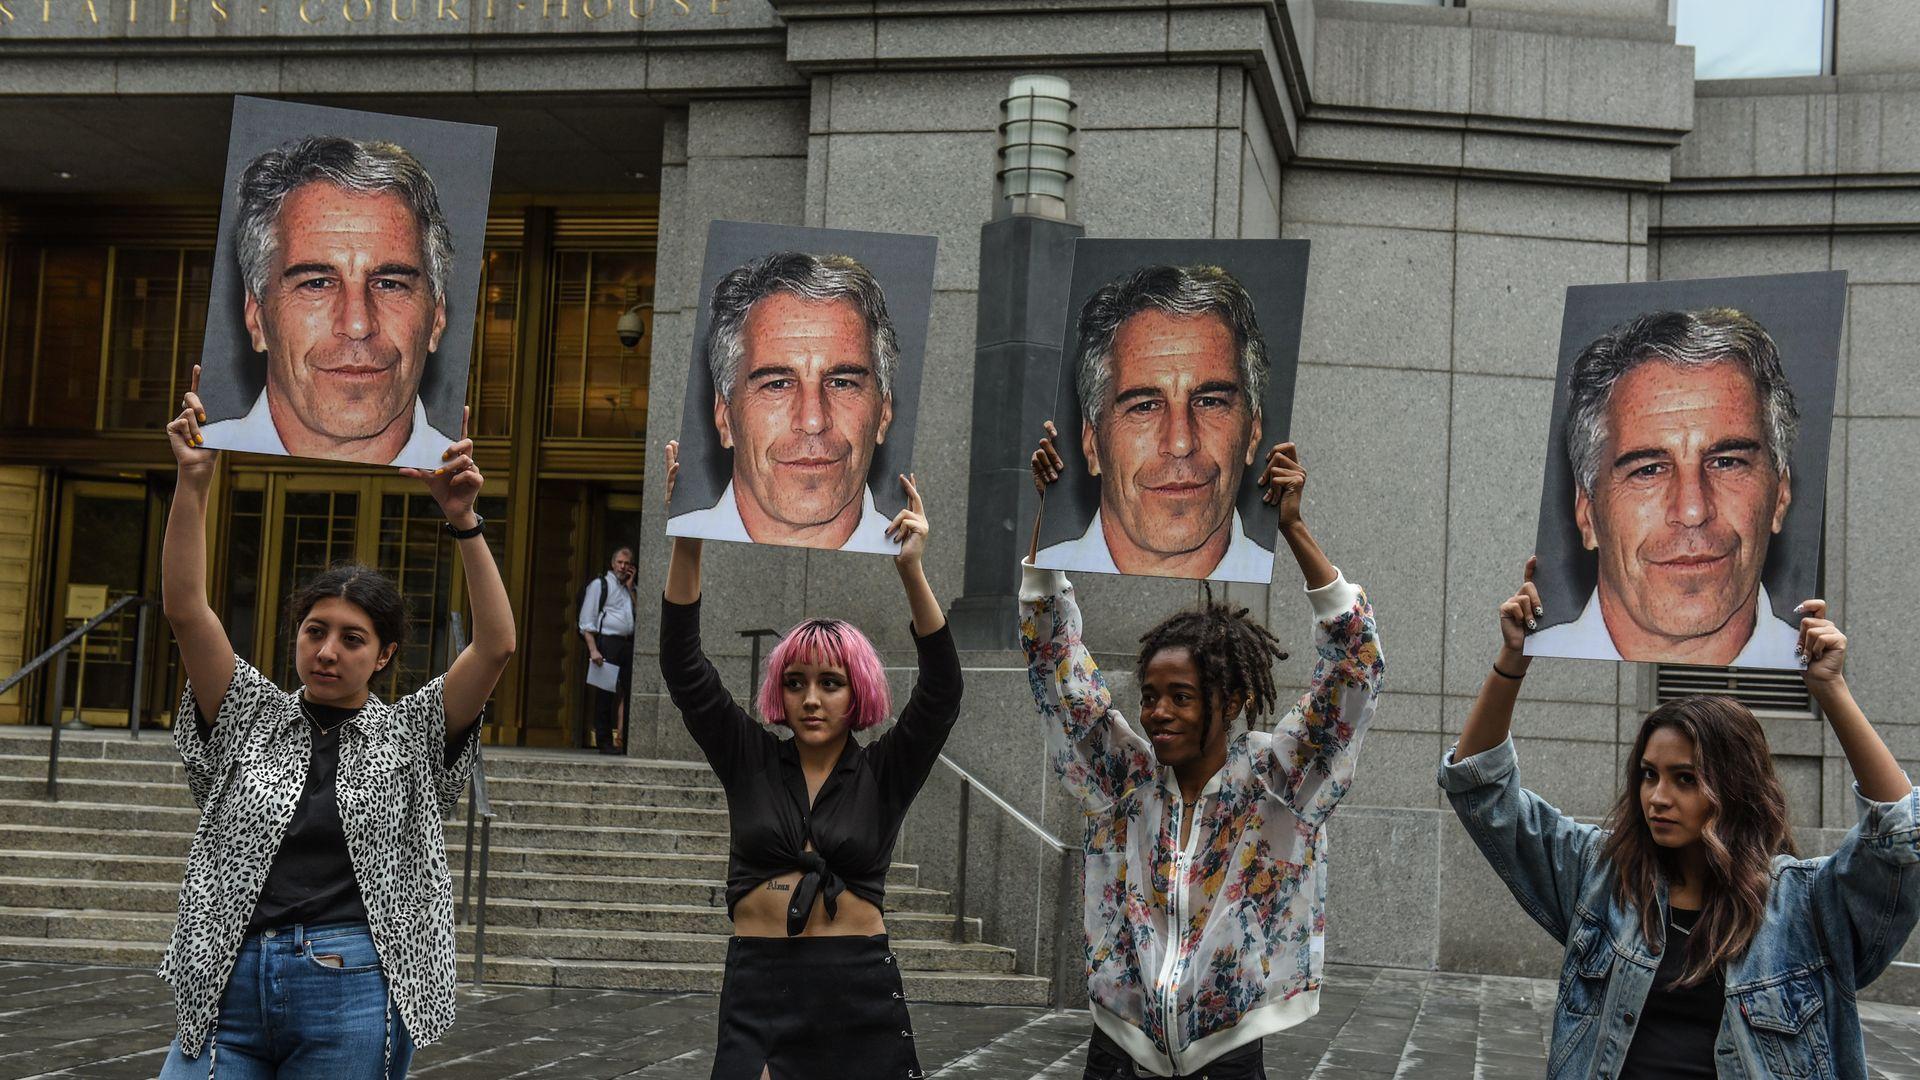 Jeffrey Epstein protestors